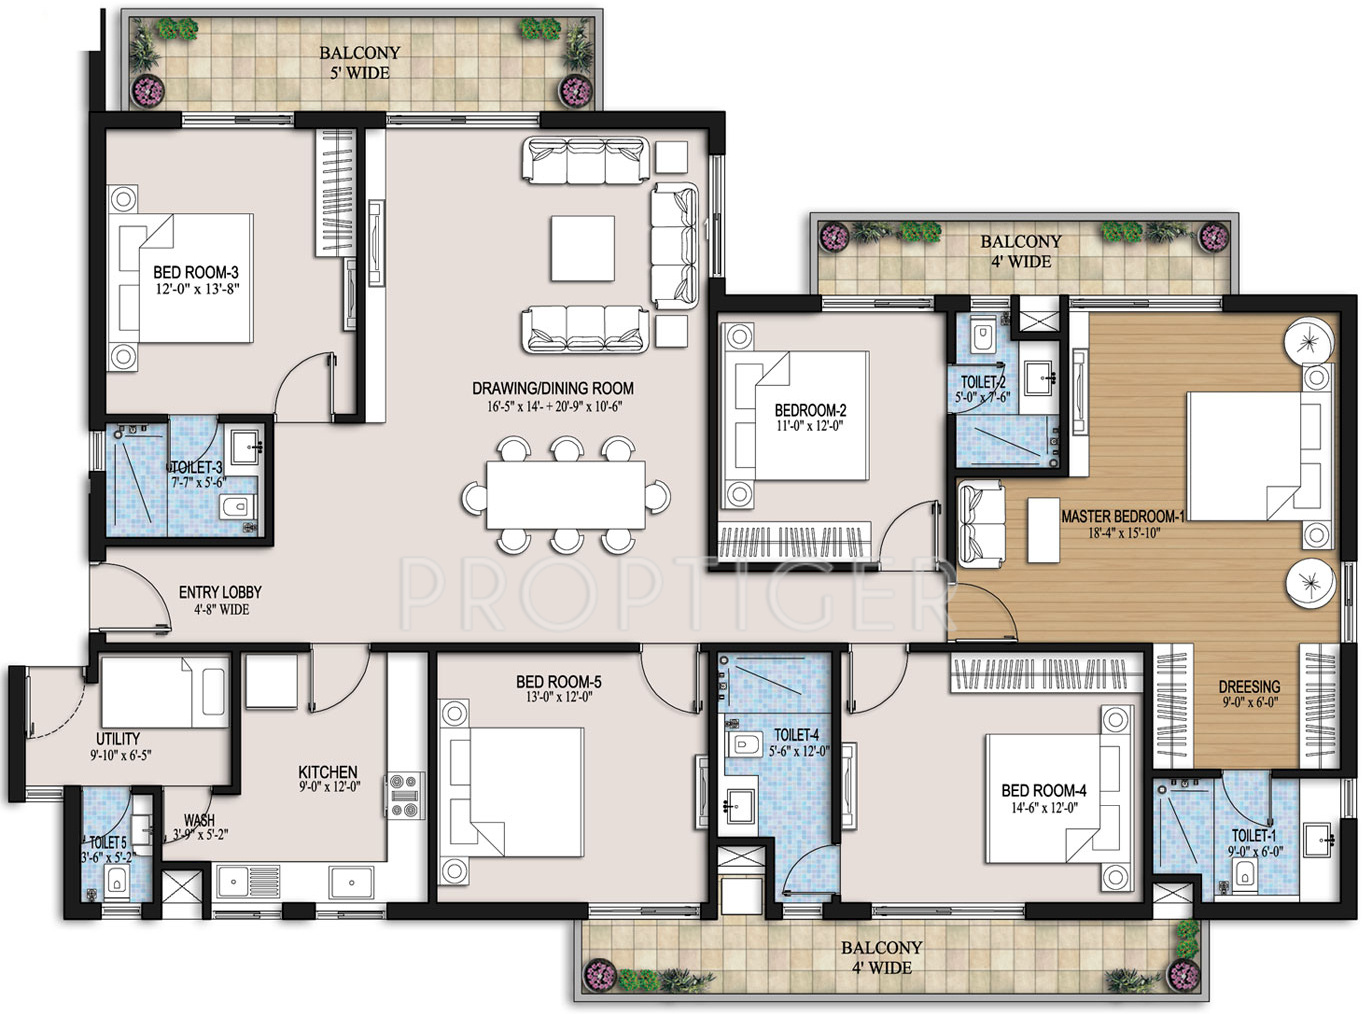 100 Bedroom 5 Bhk House Bed Bedroom 5 Bedroom House